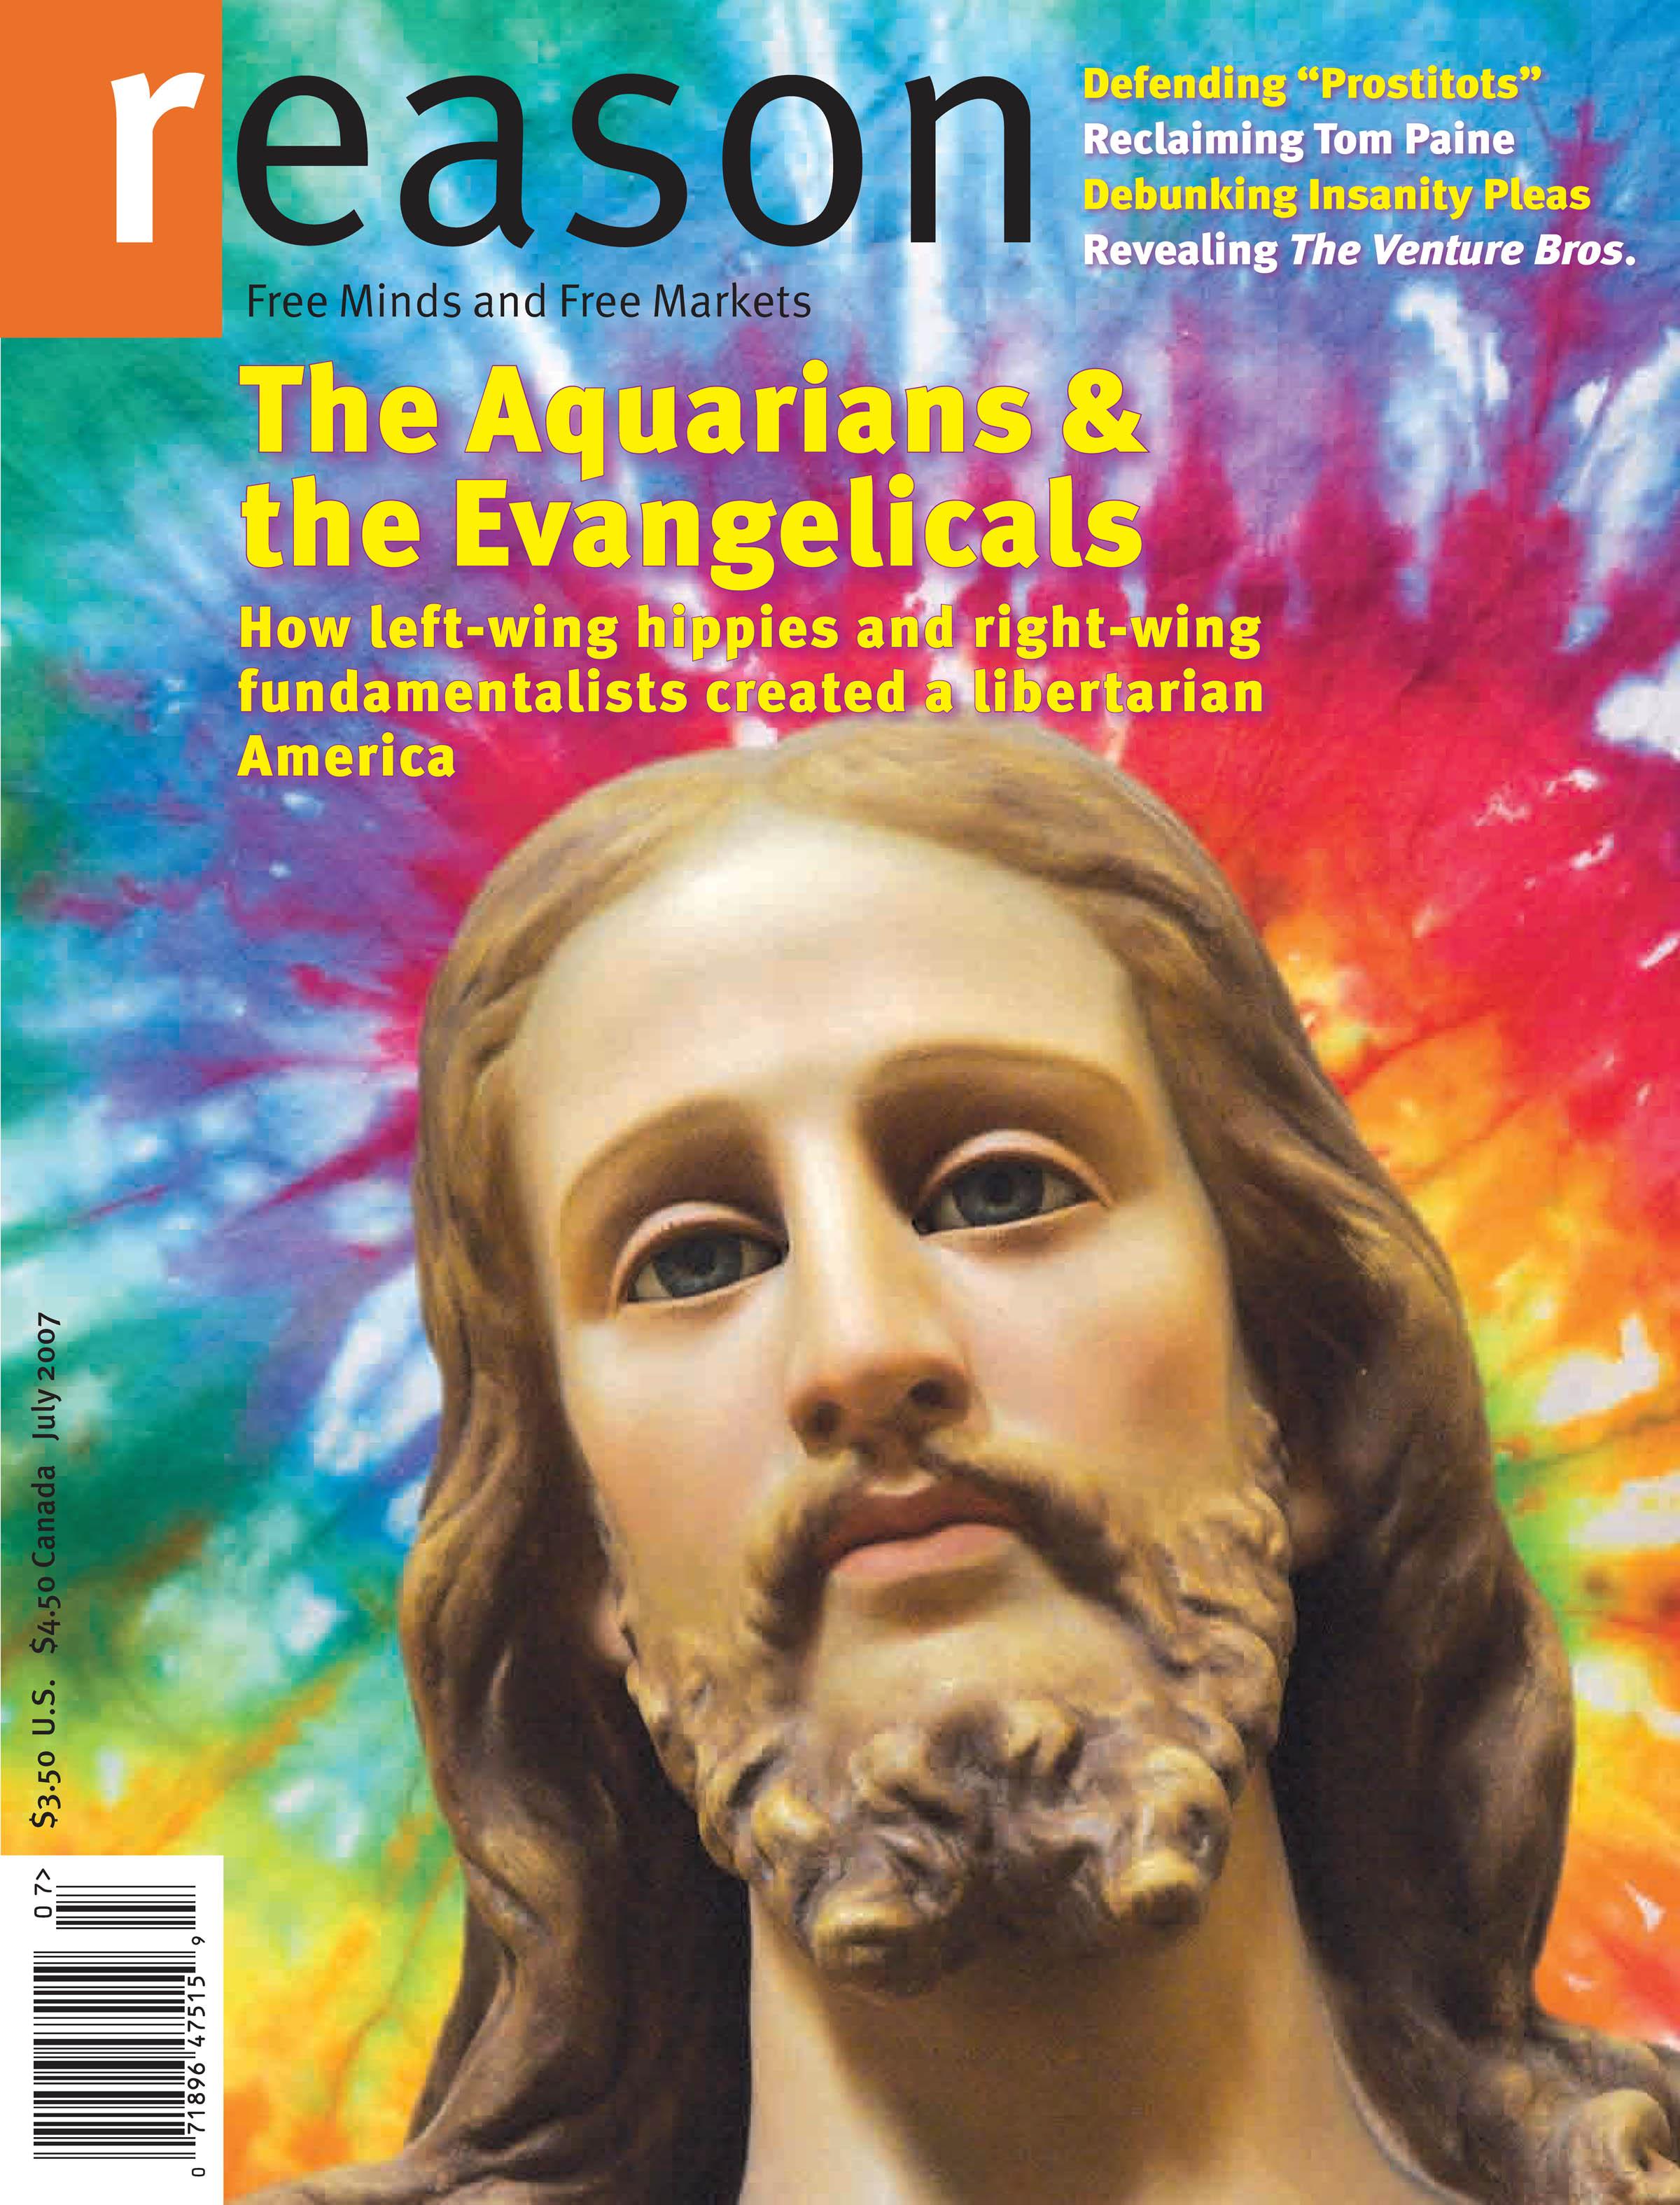 Reason Magazine, July 2007 cover image